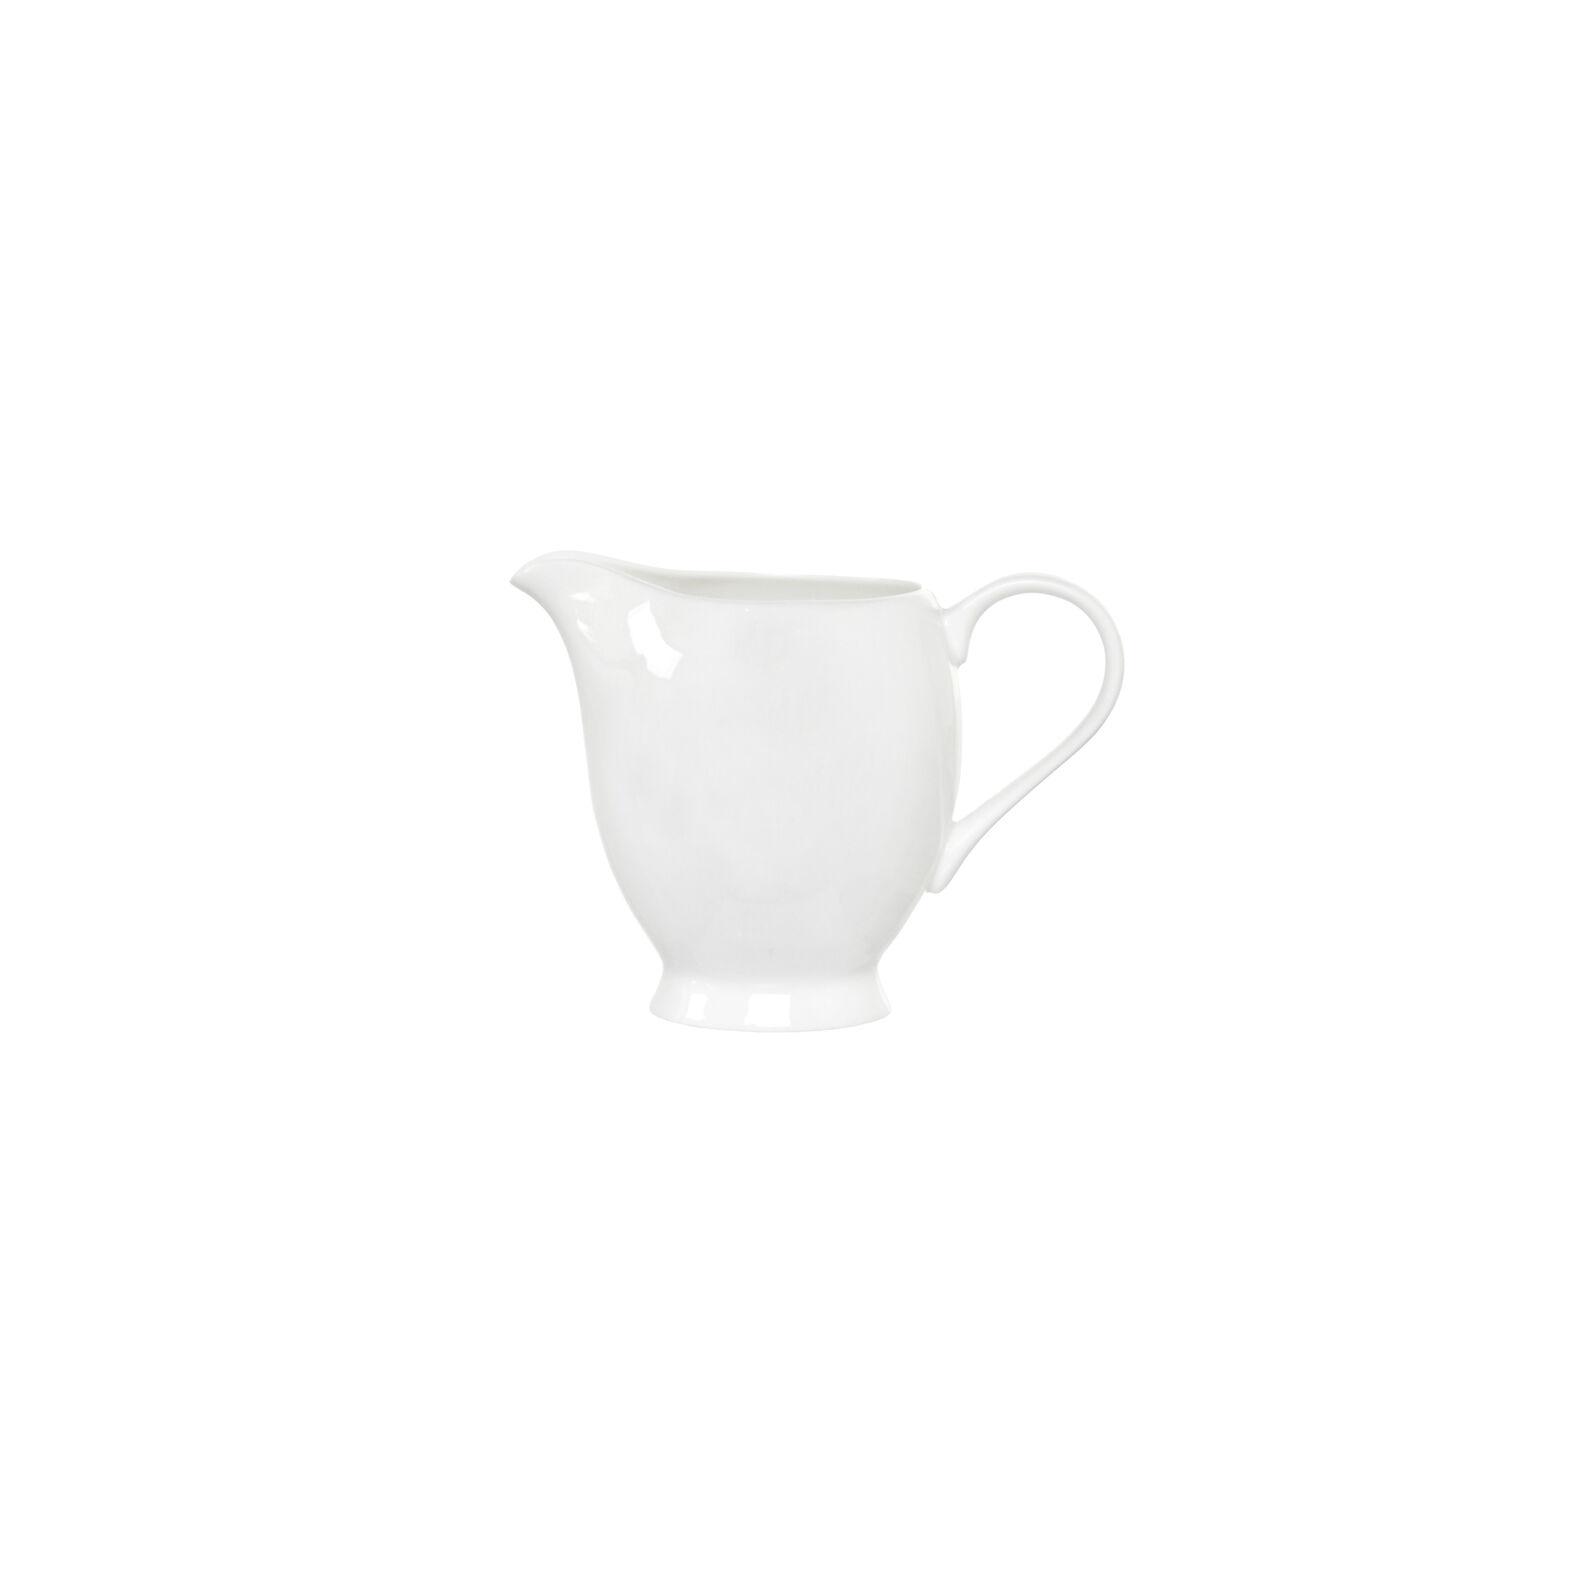 Veronica porcelain milk jug